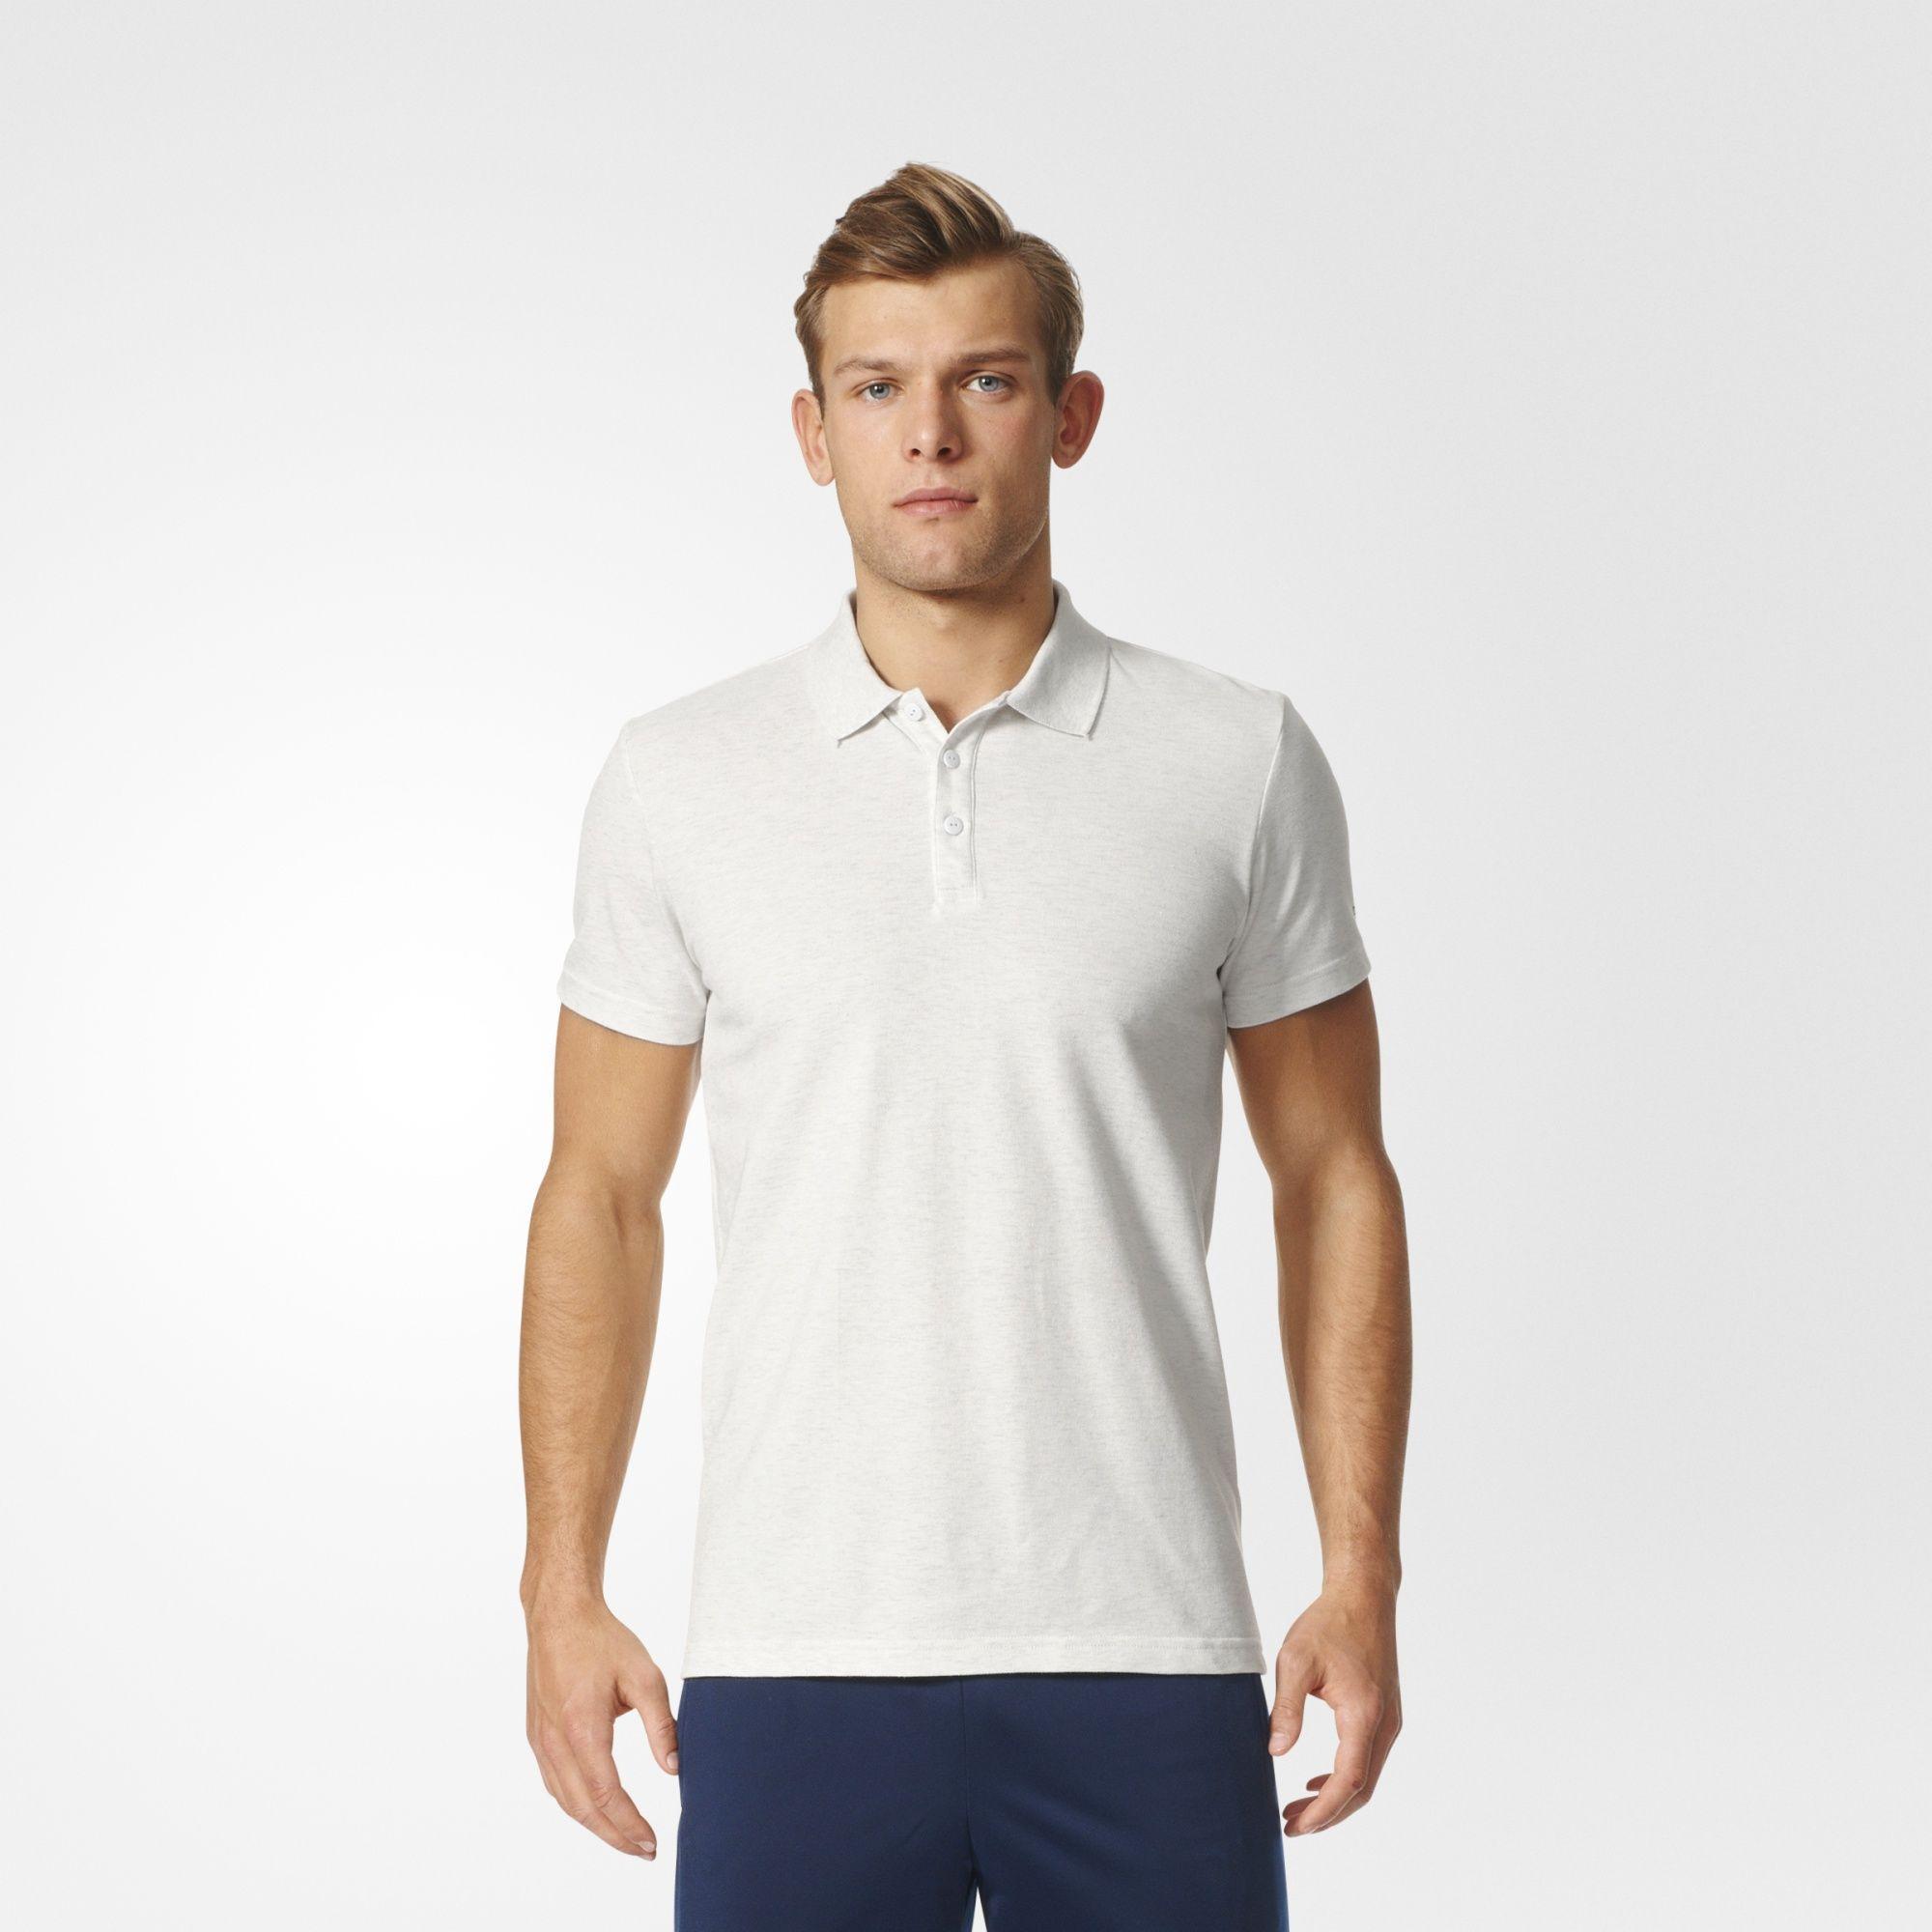 Herren Essentials Basic Poloshirt,